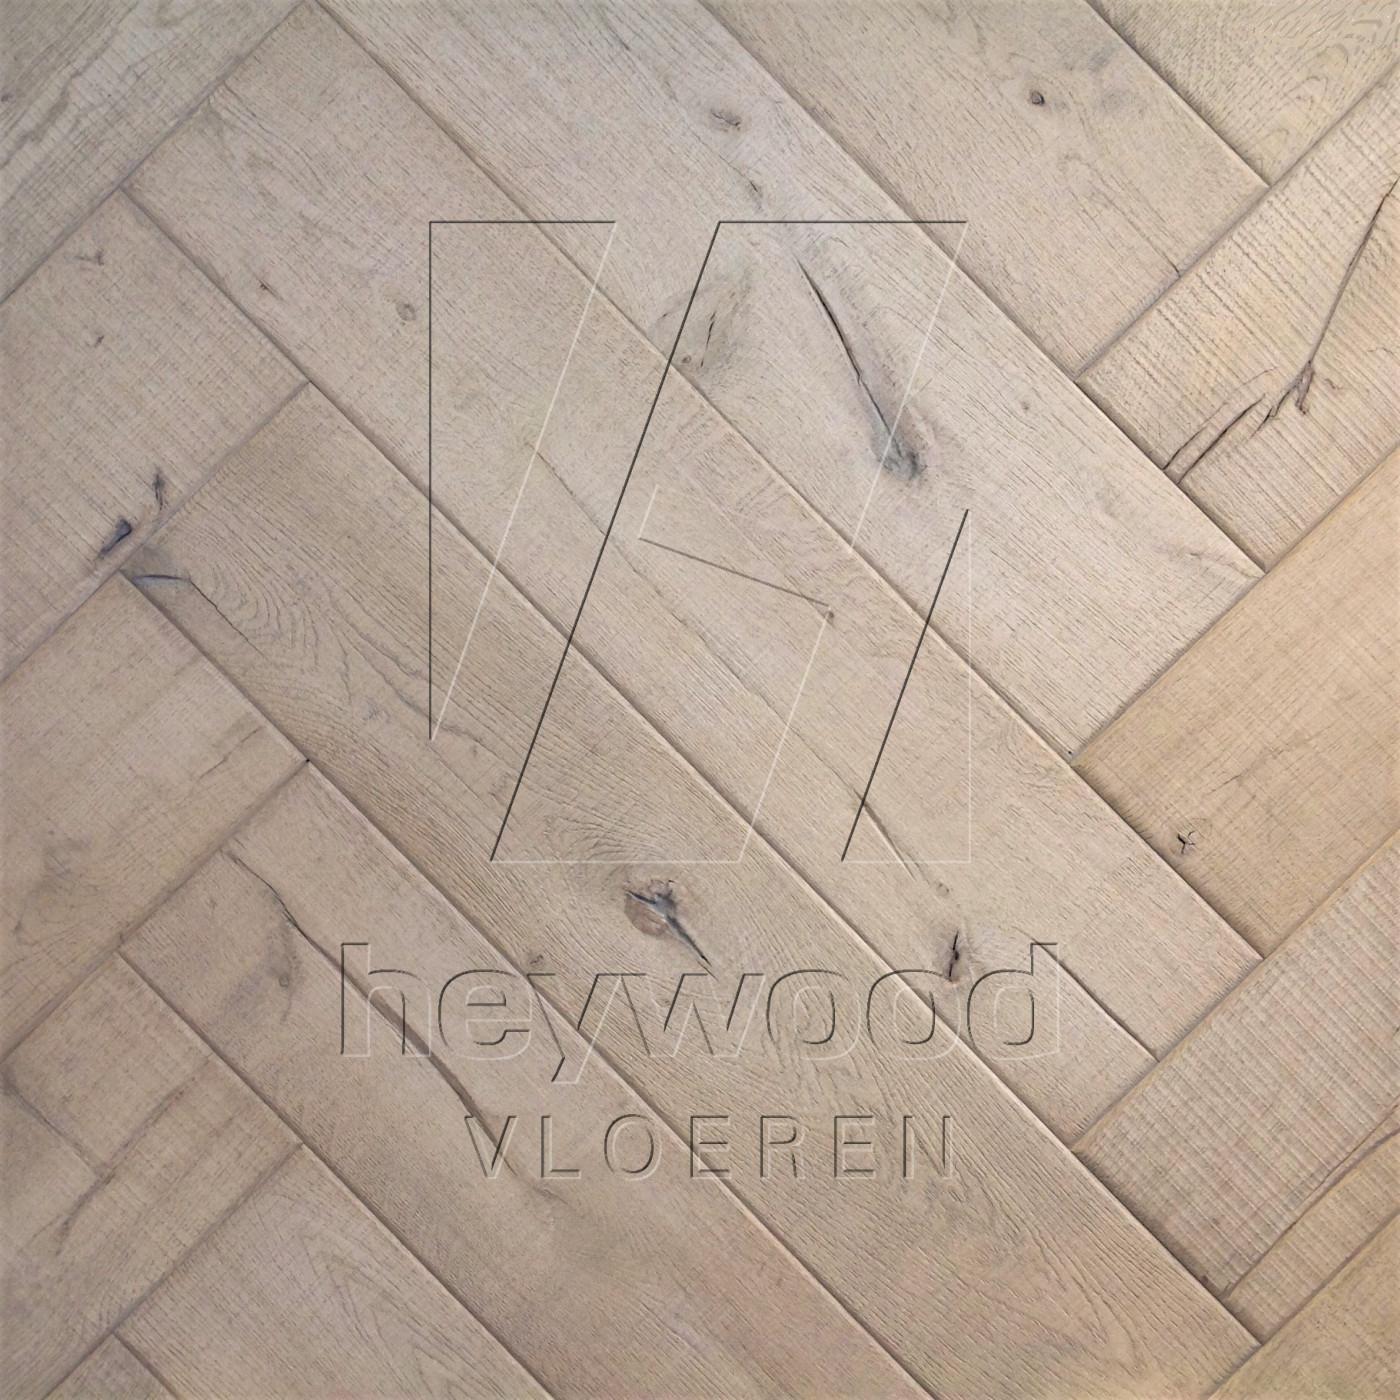 Knotting Hill Herringbone 'Yosemite' in Herringbone of Pattern & Panel Floors